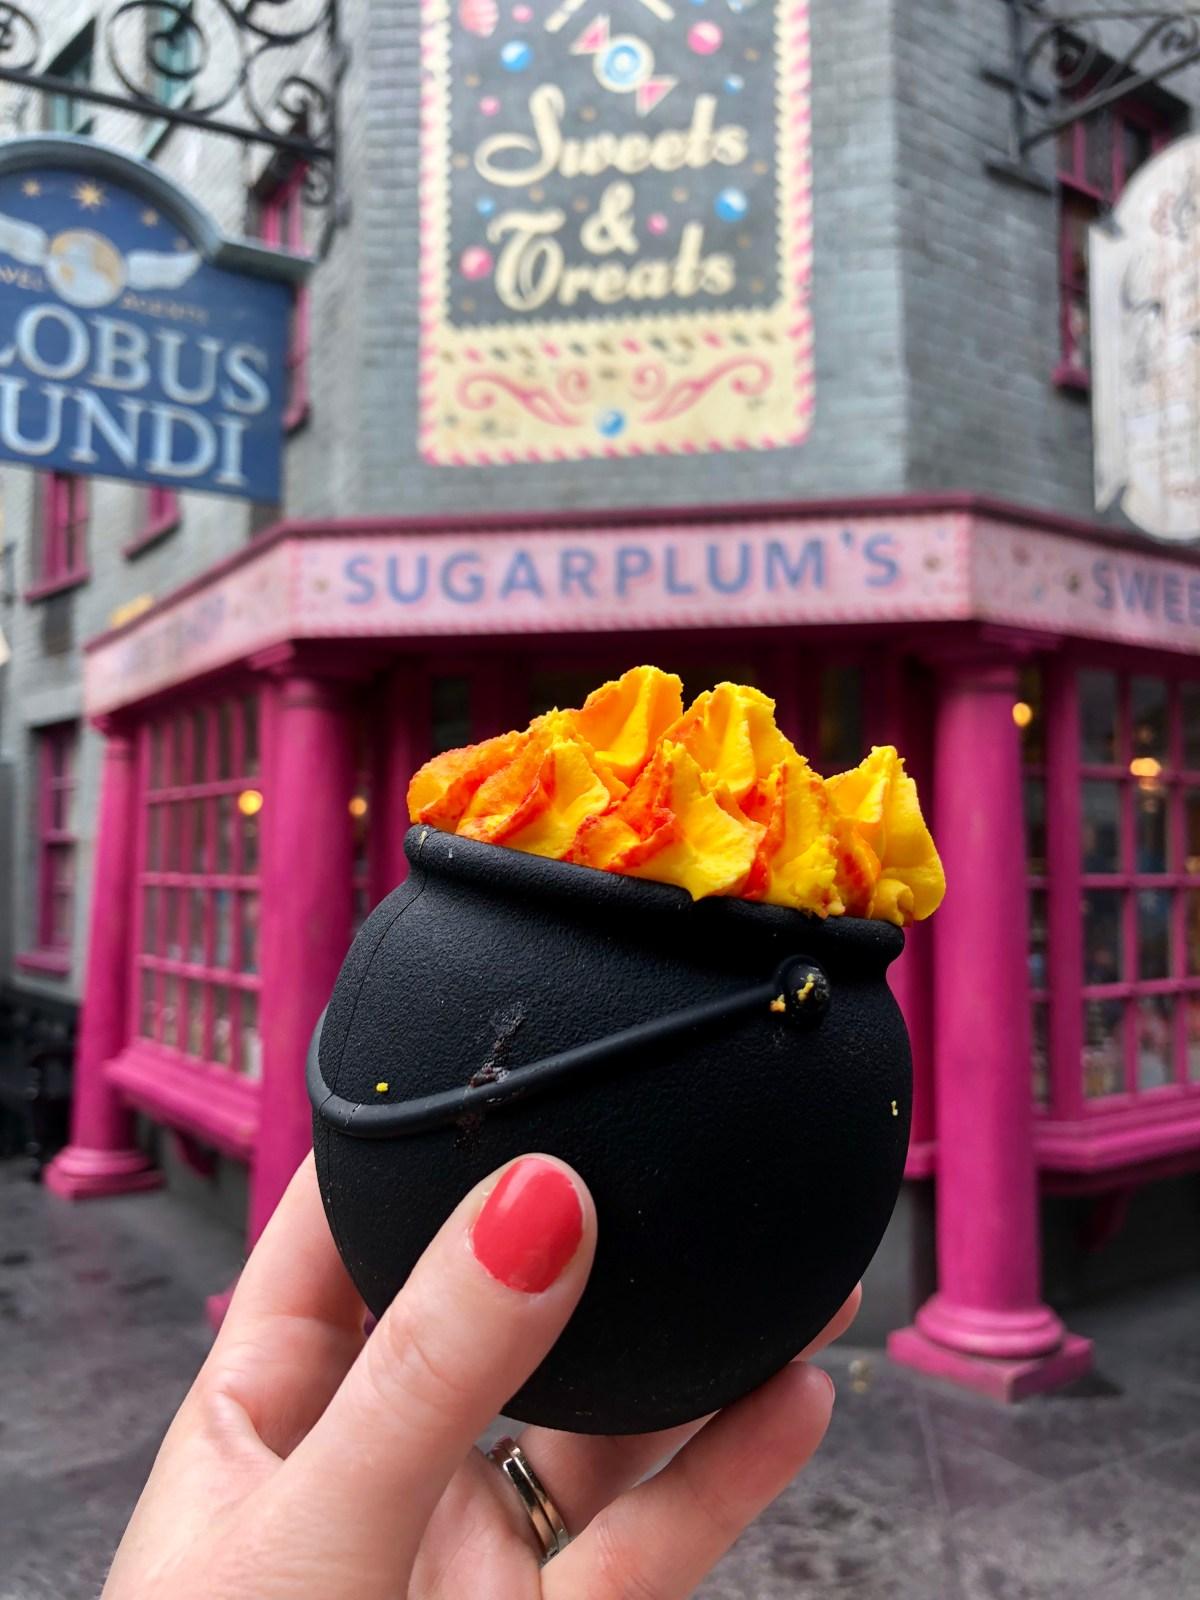 Chocolate Cauldron Cupcake at Sugarplum's Sweet Shop #chocolatecauldron #sugarplumssweetshop #universalorlandofood #diagonalley #harrypotter